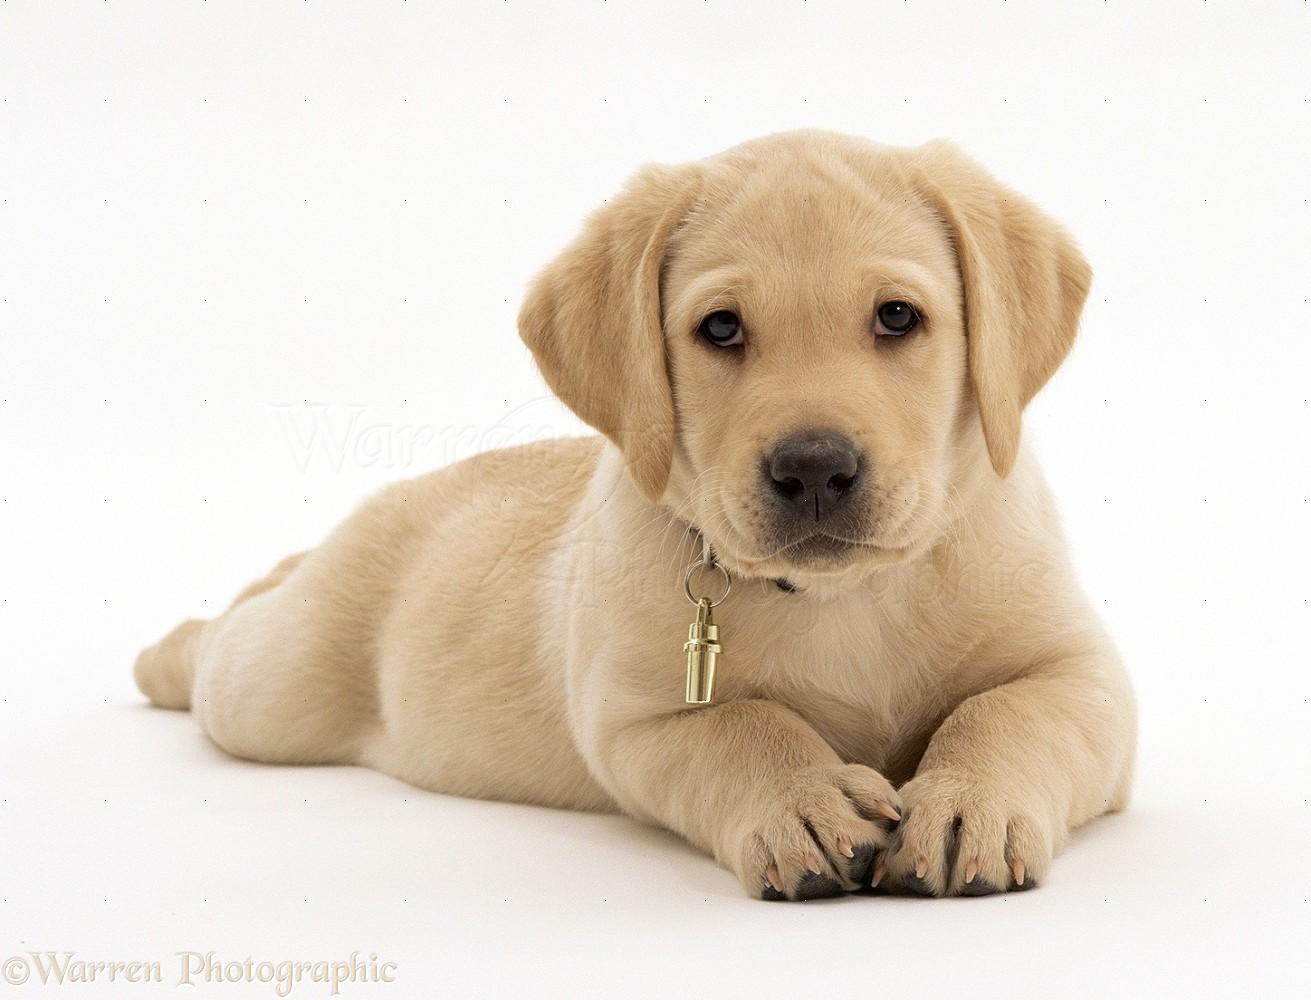 23935 Yellow Labrador Retriever puppy white backgroundjpg 1311x1000